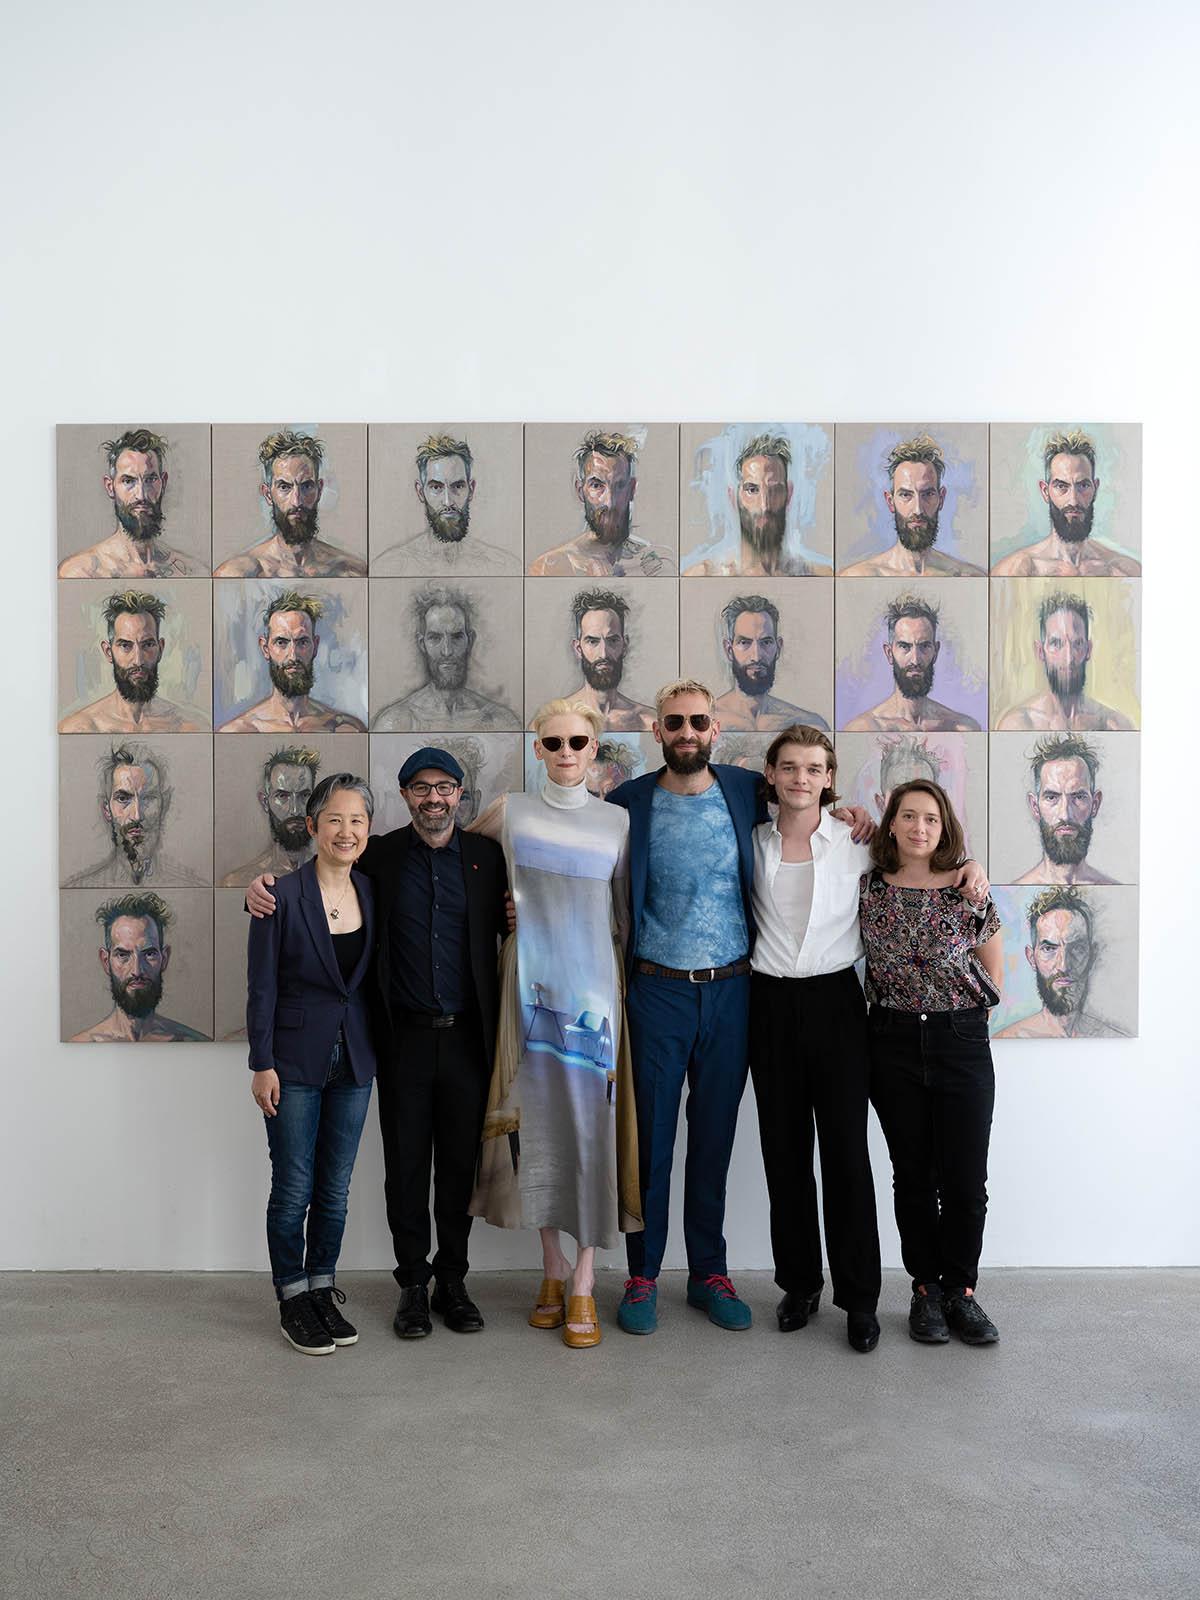 Hana Usui, Marcello Farabegoli, Tilda, Sandro, Luki Wadlinger und Chiara Campanile